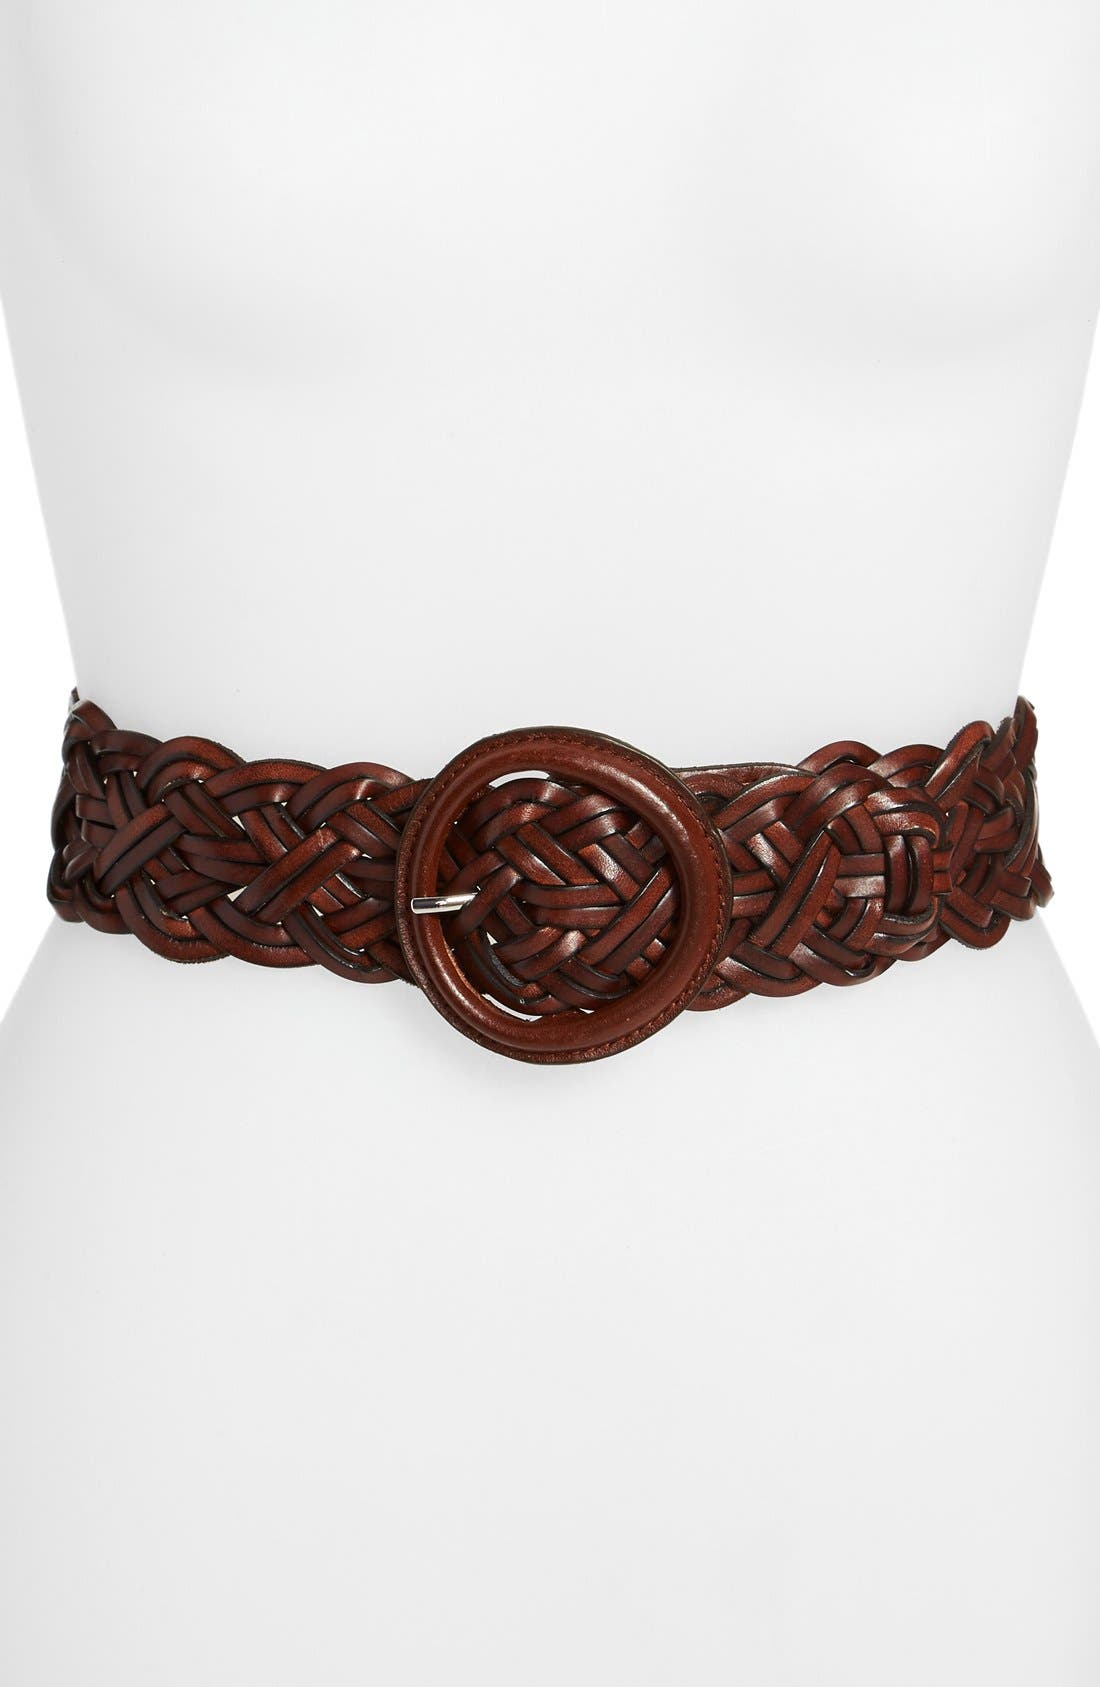 Alternate Image 1 Selected - Lauren Ralph Lauren Braided Leather Belt